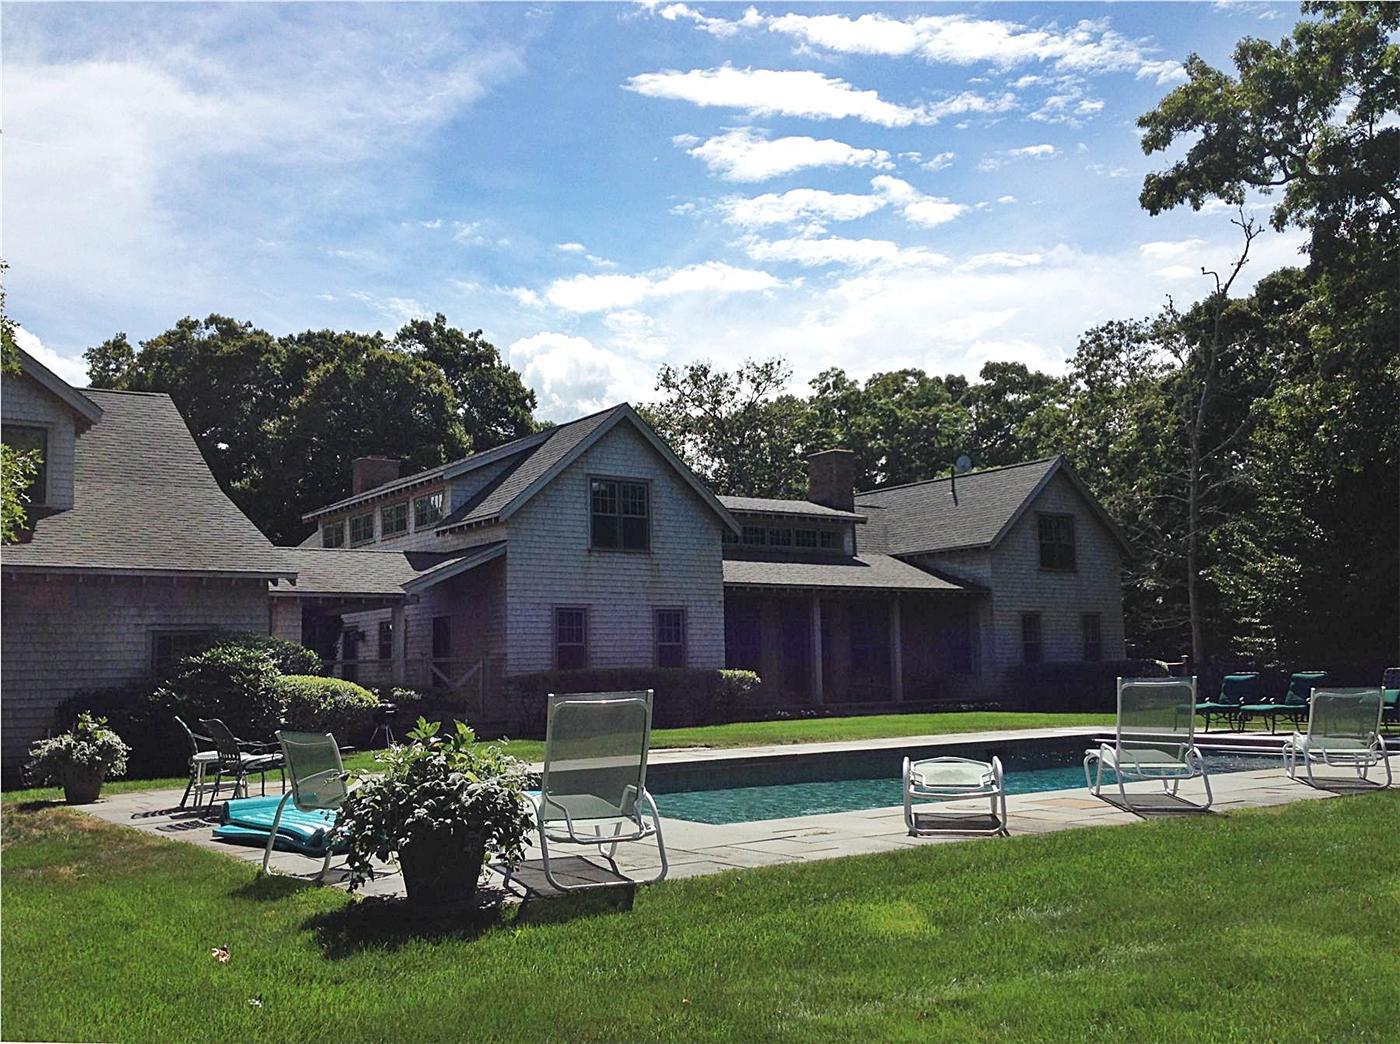 West Tisbury Vacation Rental Home In Martha's Vineyard MA